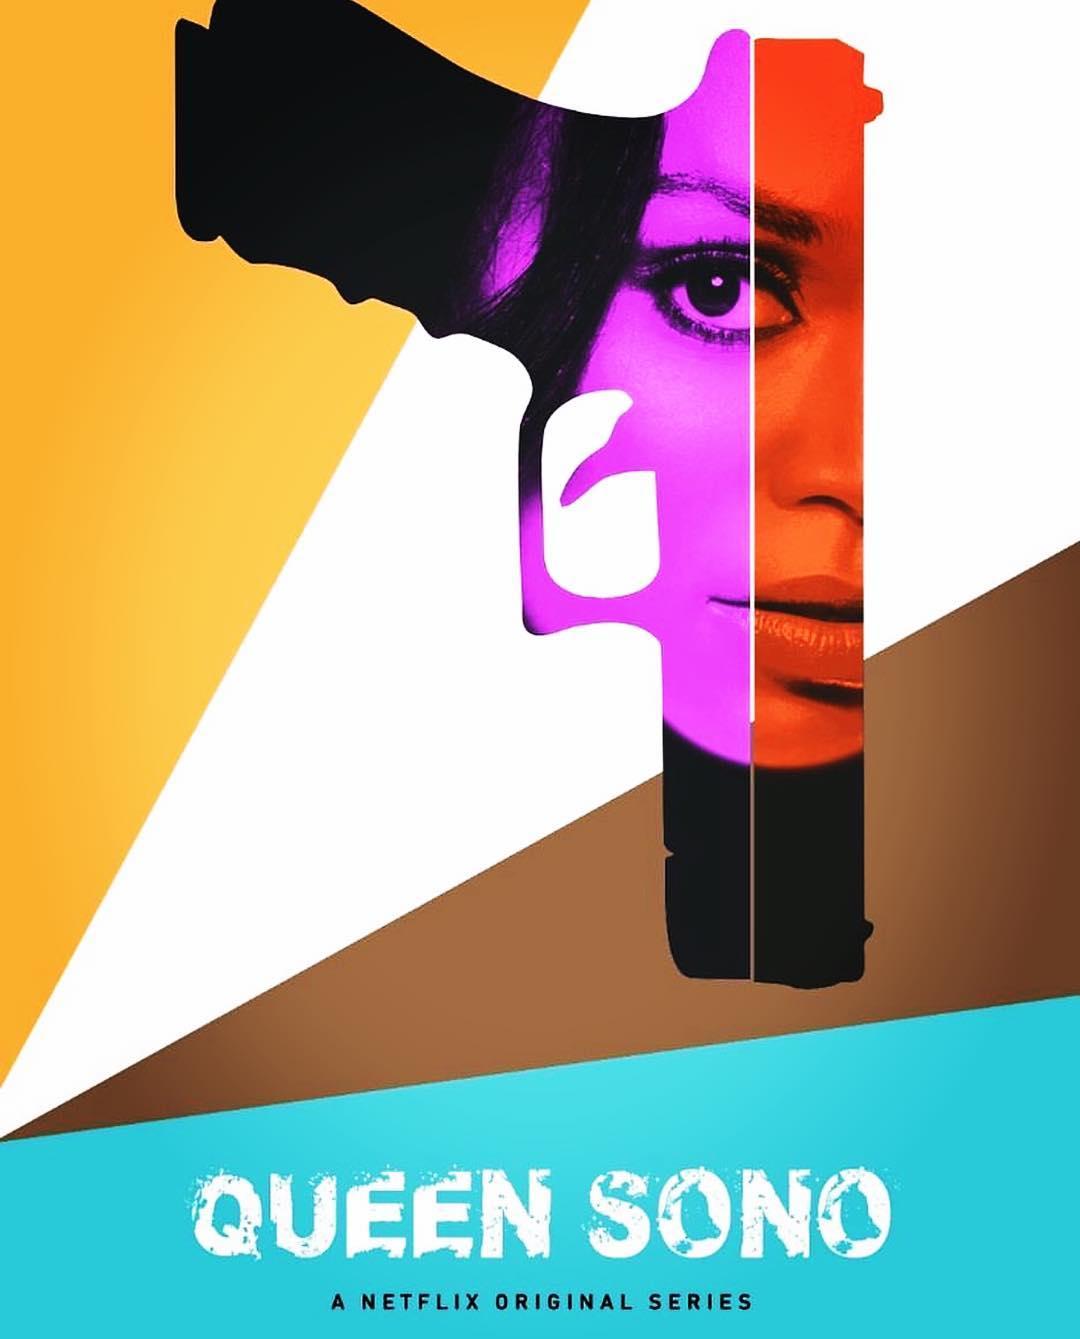 Queen Sono, a Netflix Original Series